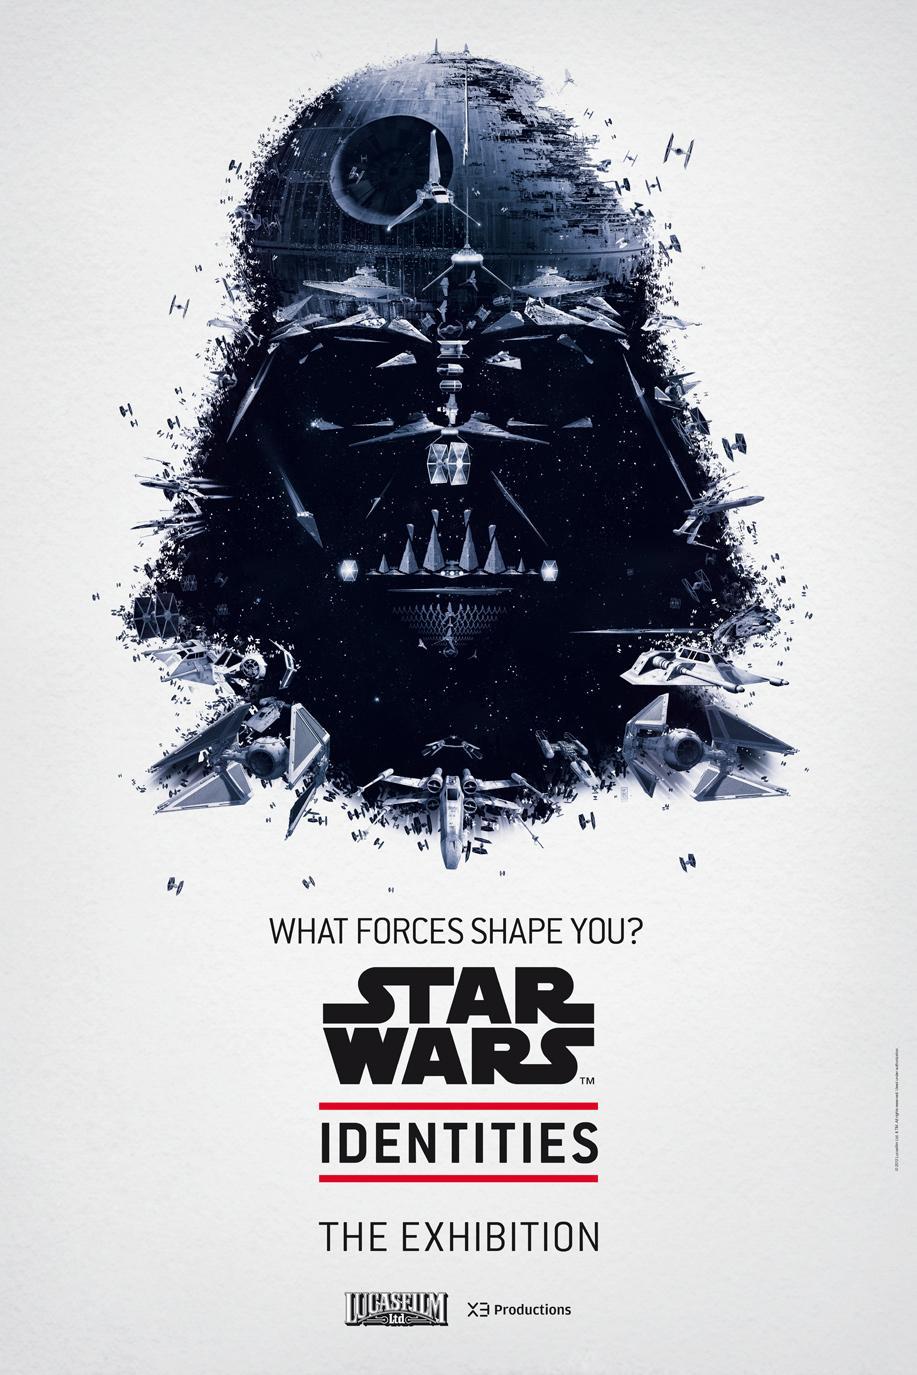 Star Wars Outdoor Ad -  The Exhibition, Darth Vader